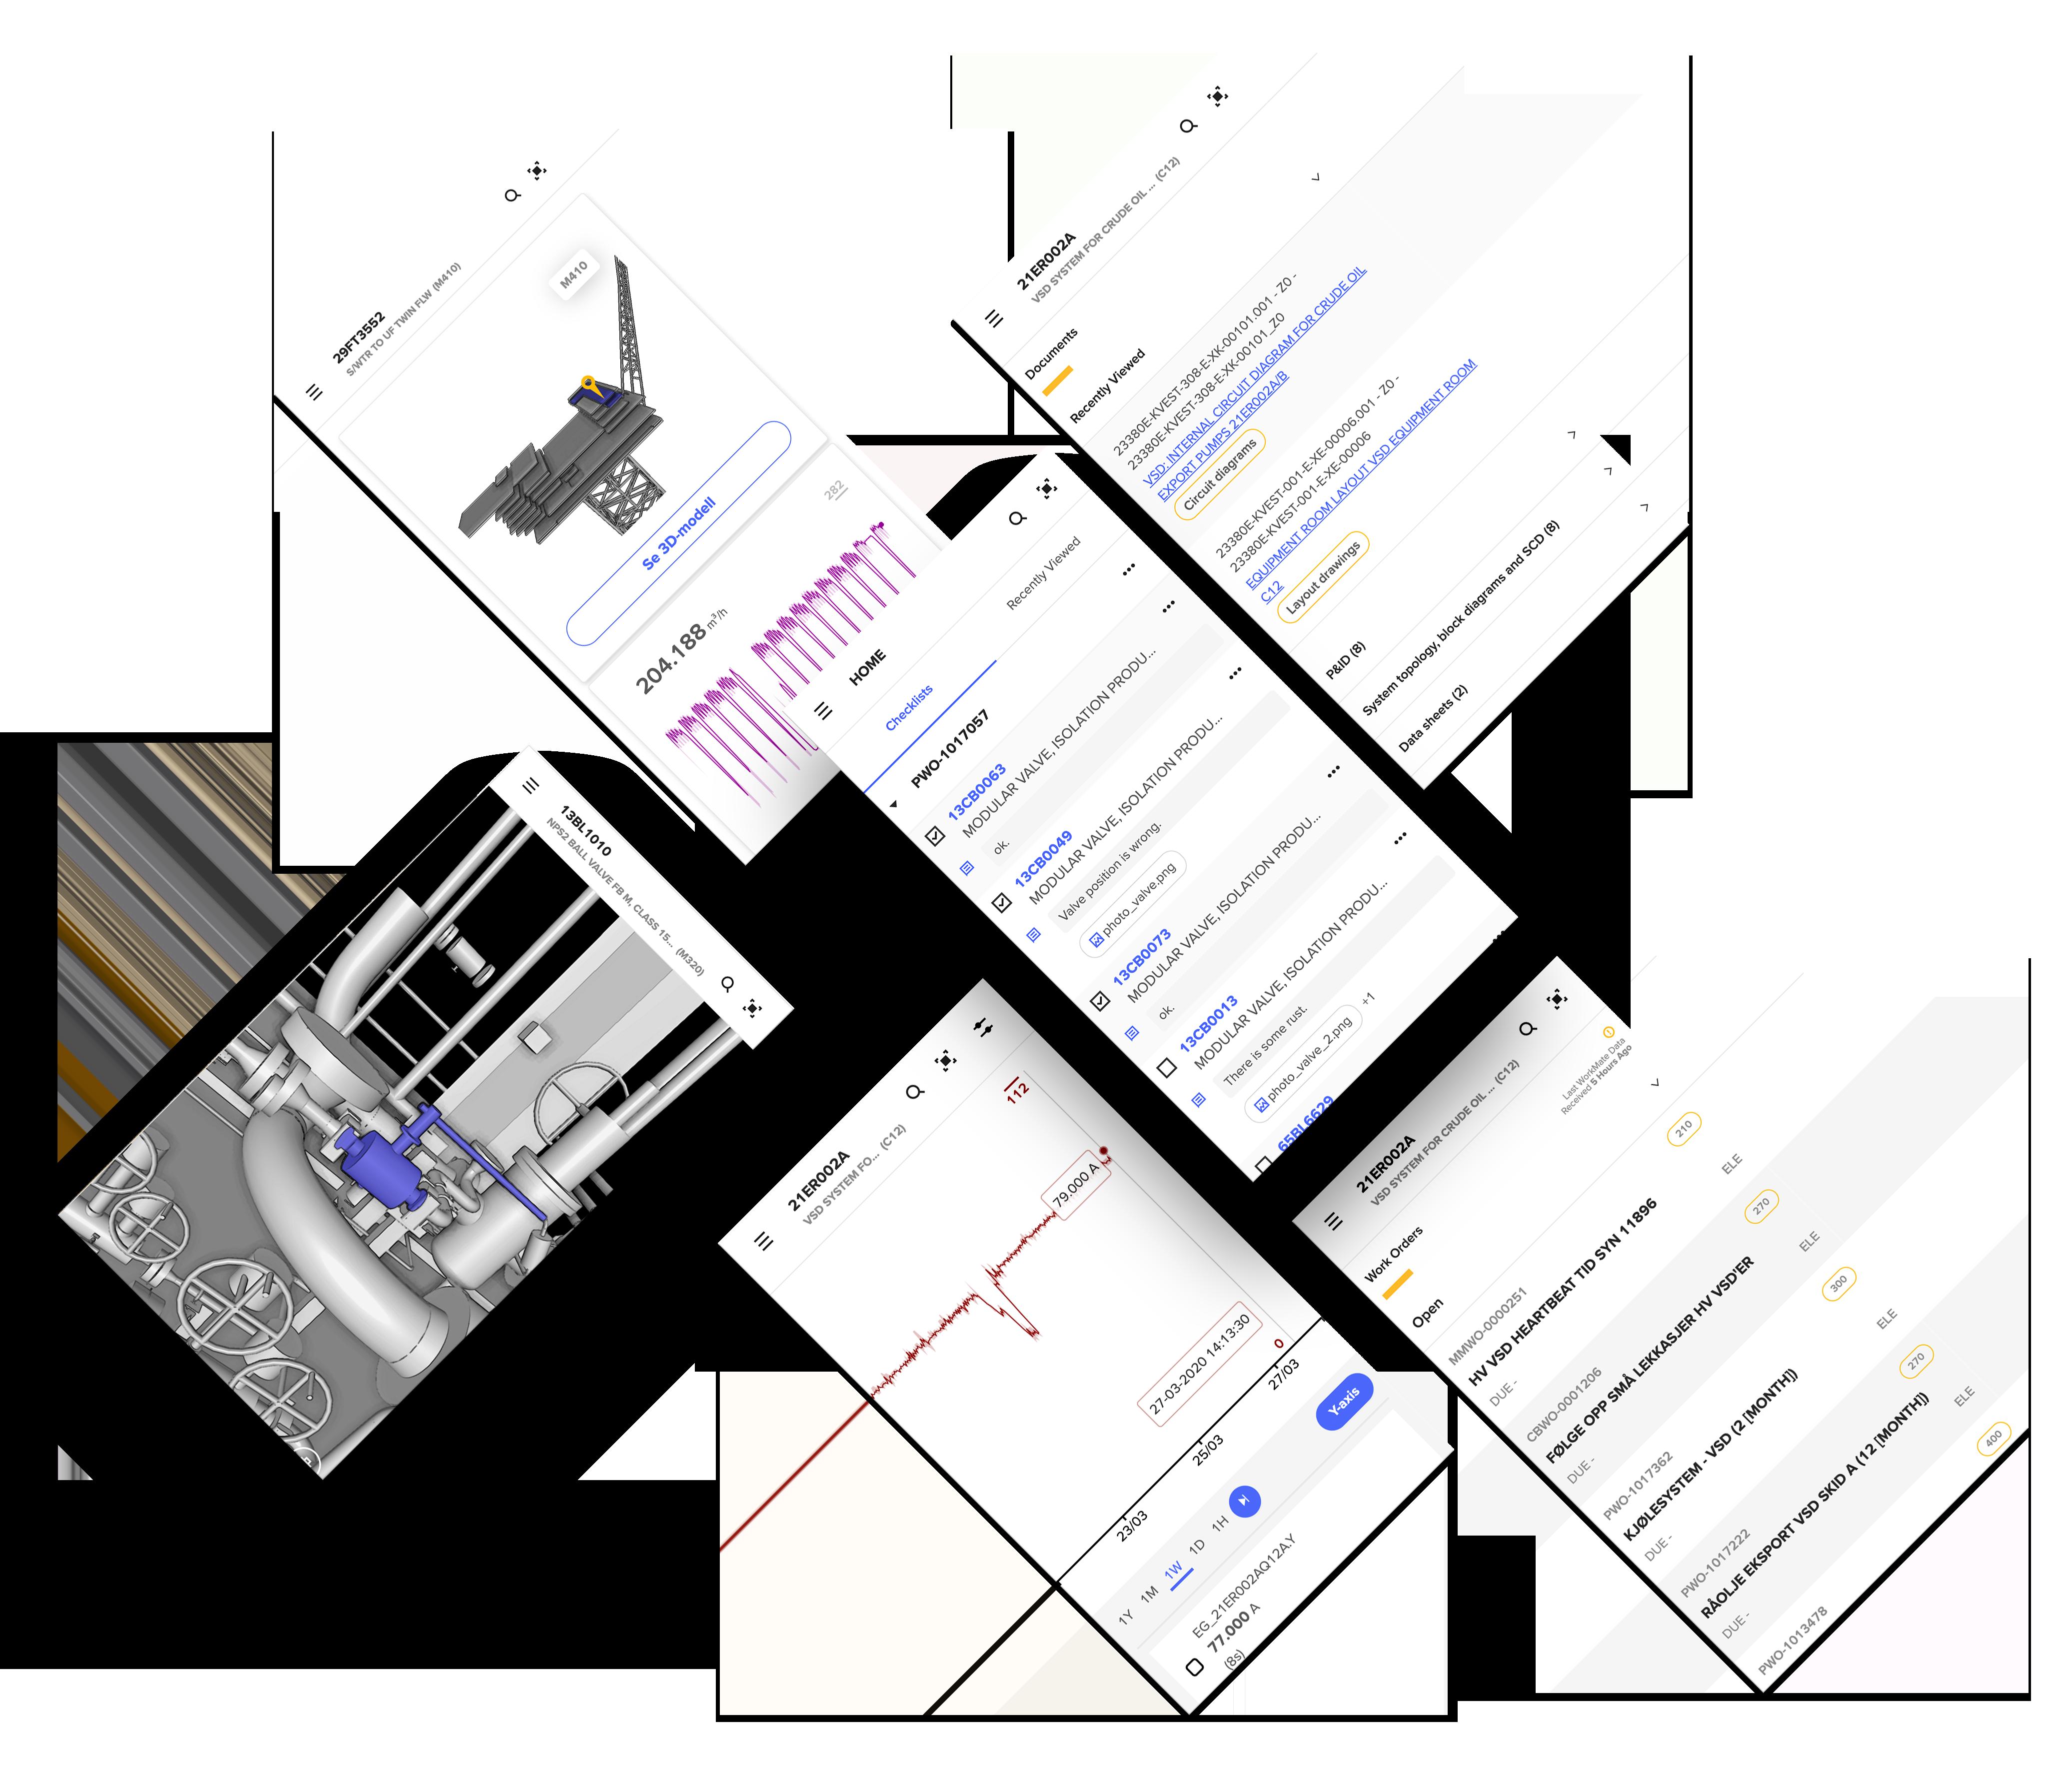 infield_app-screens-mockup